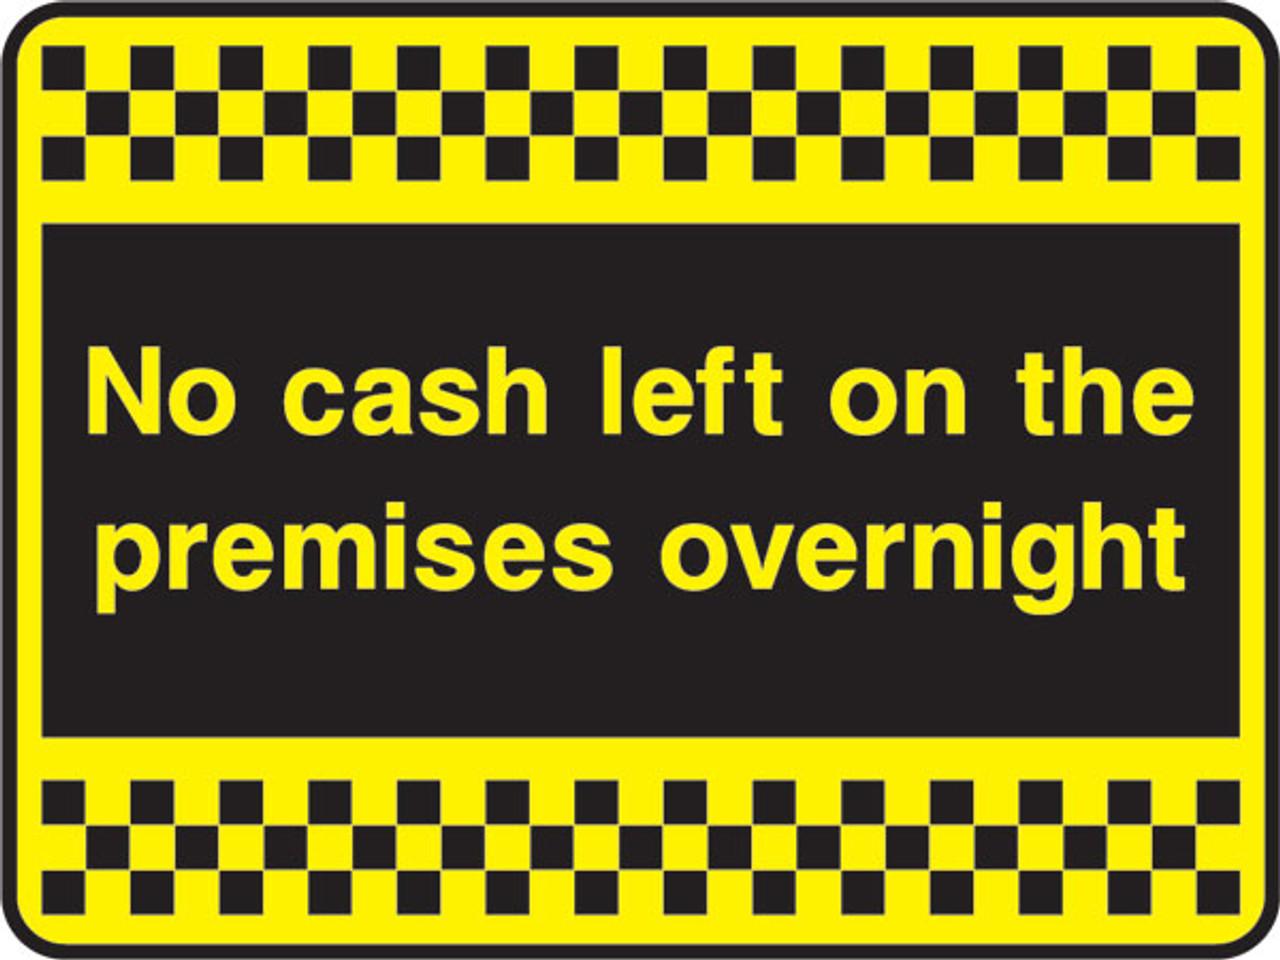 No cash left on these premises sticker